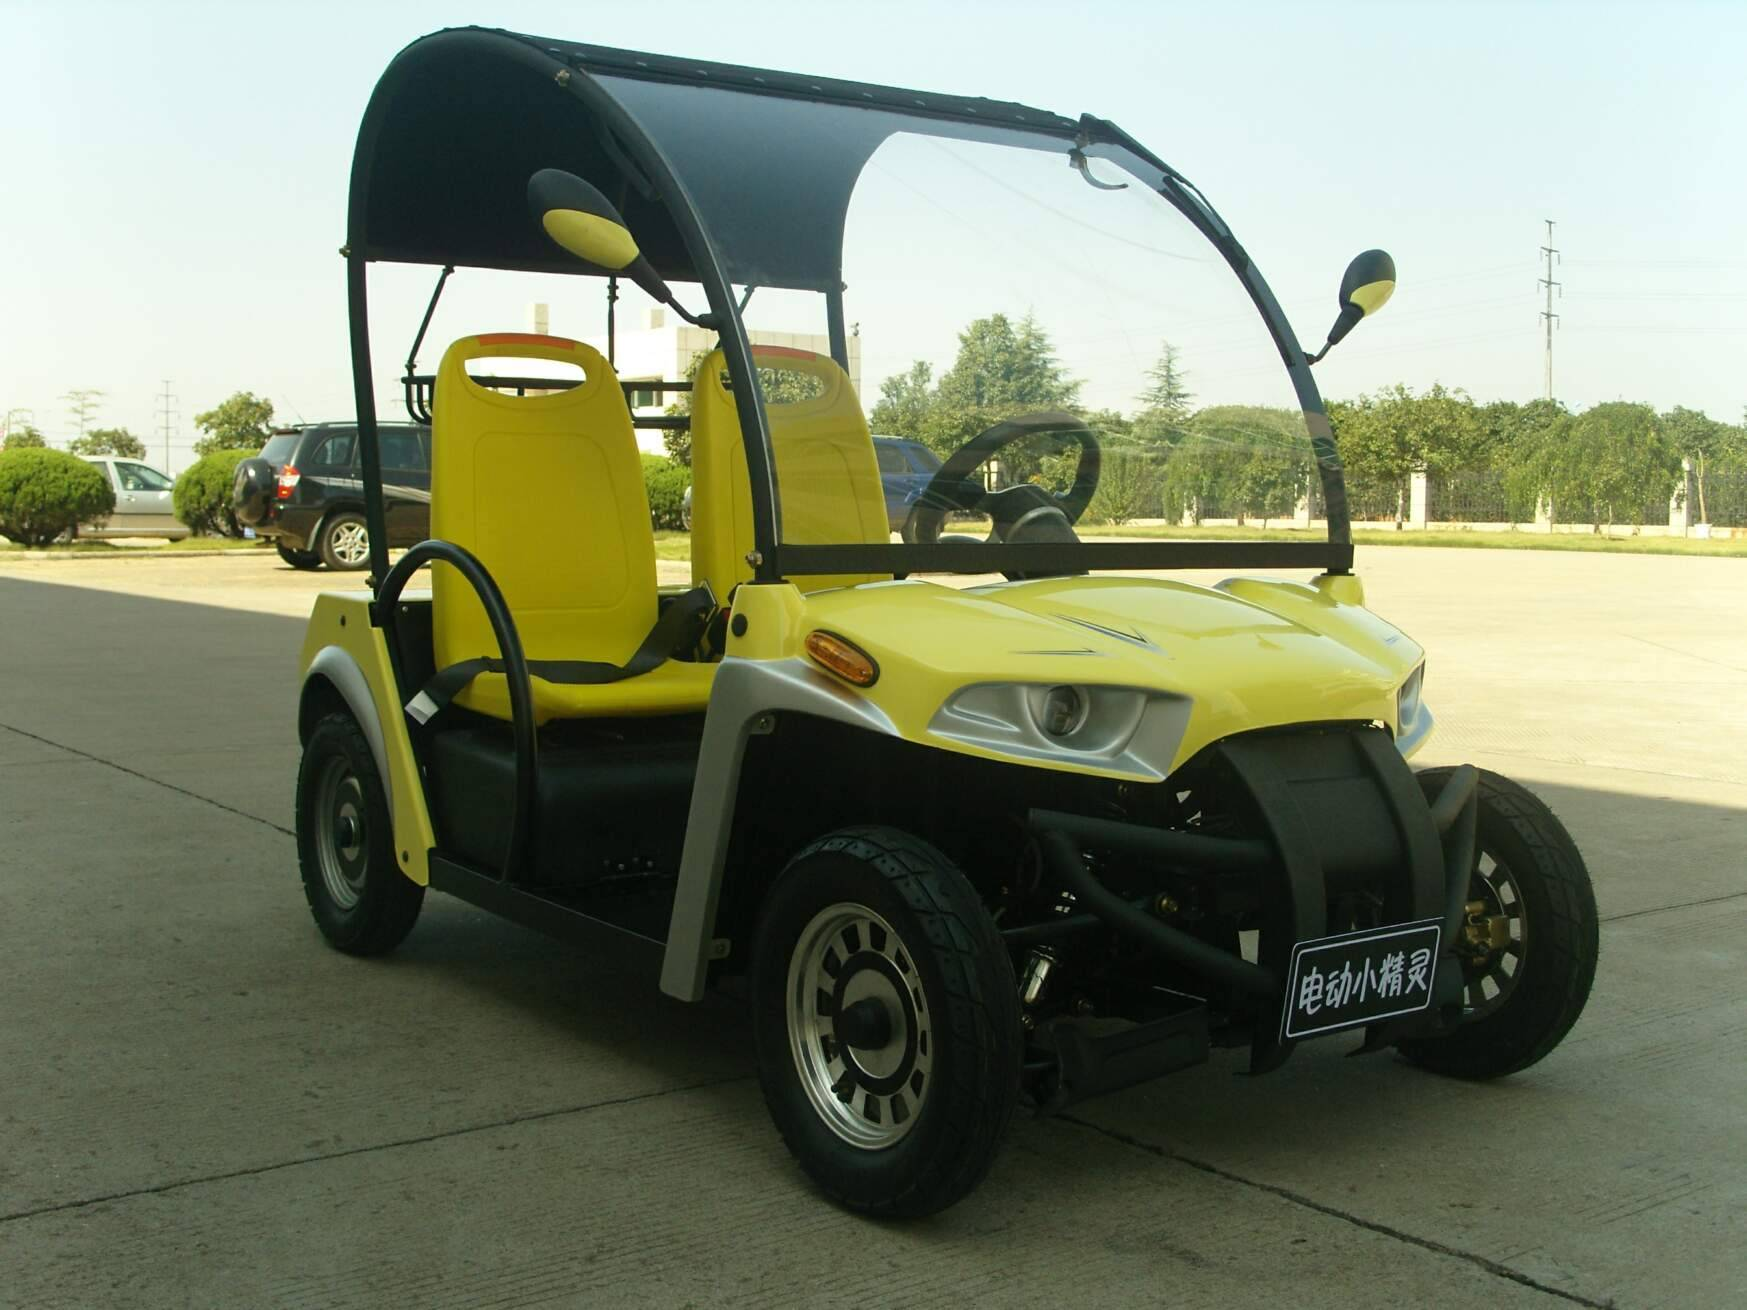 Electric Utility Vehicle Utv Kd 800ev2 Kandi Vehicle